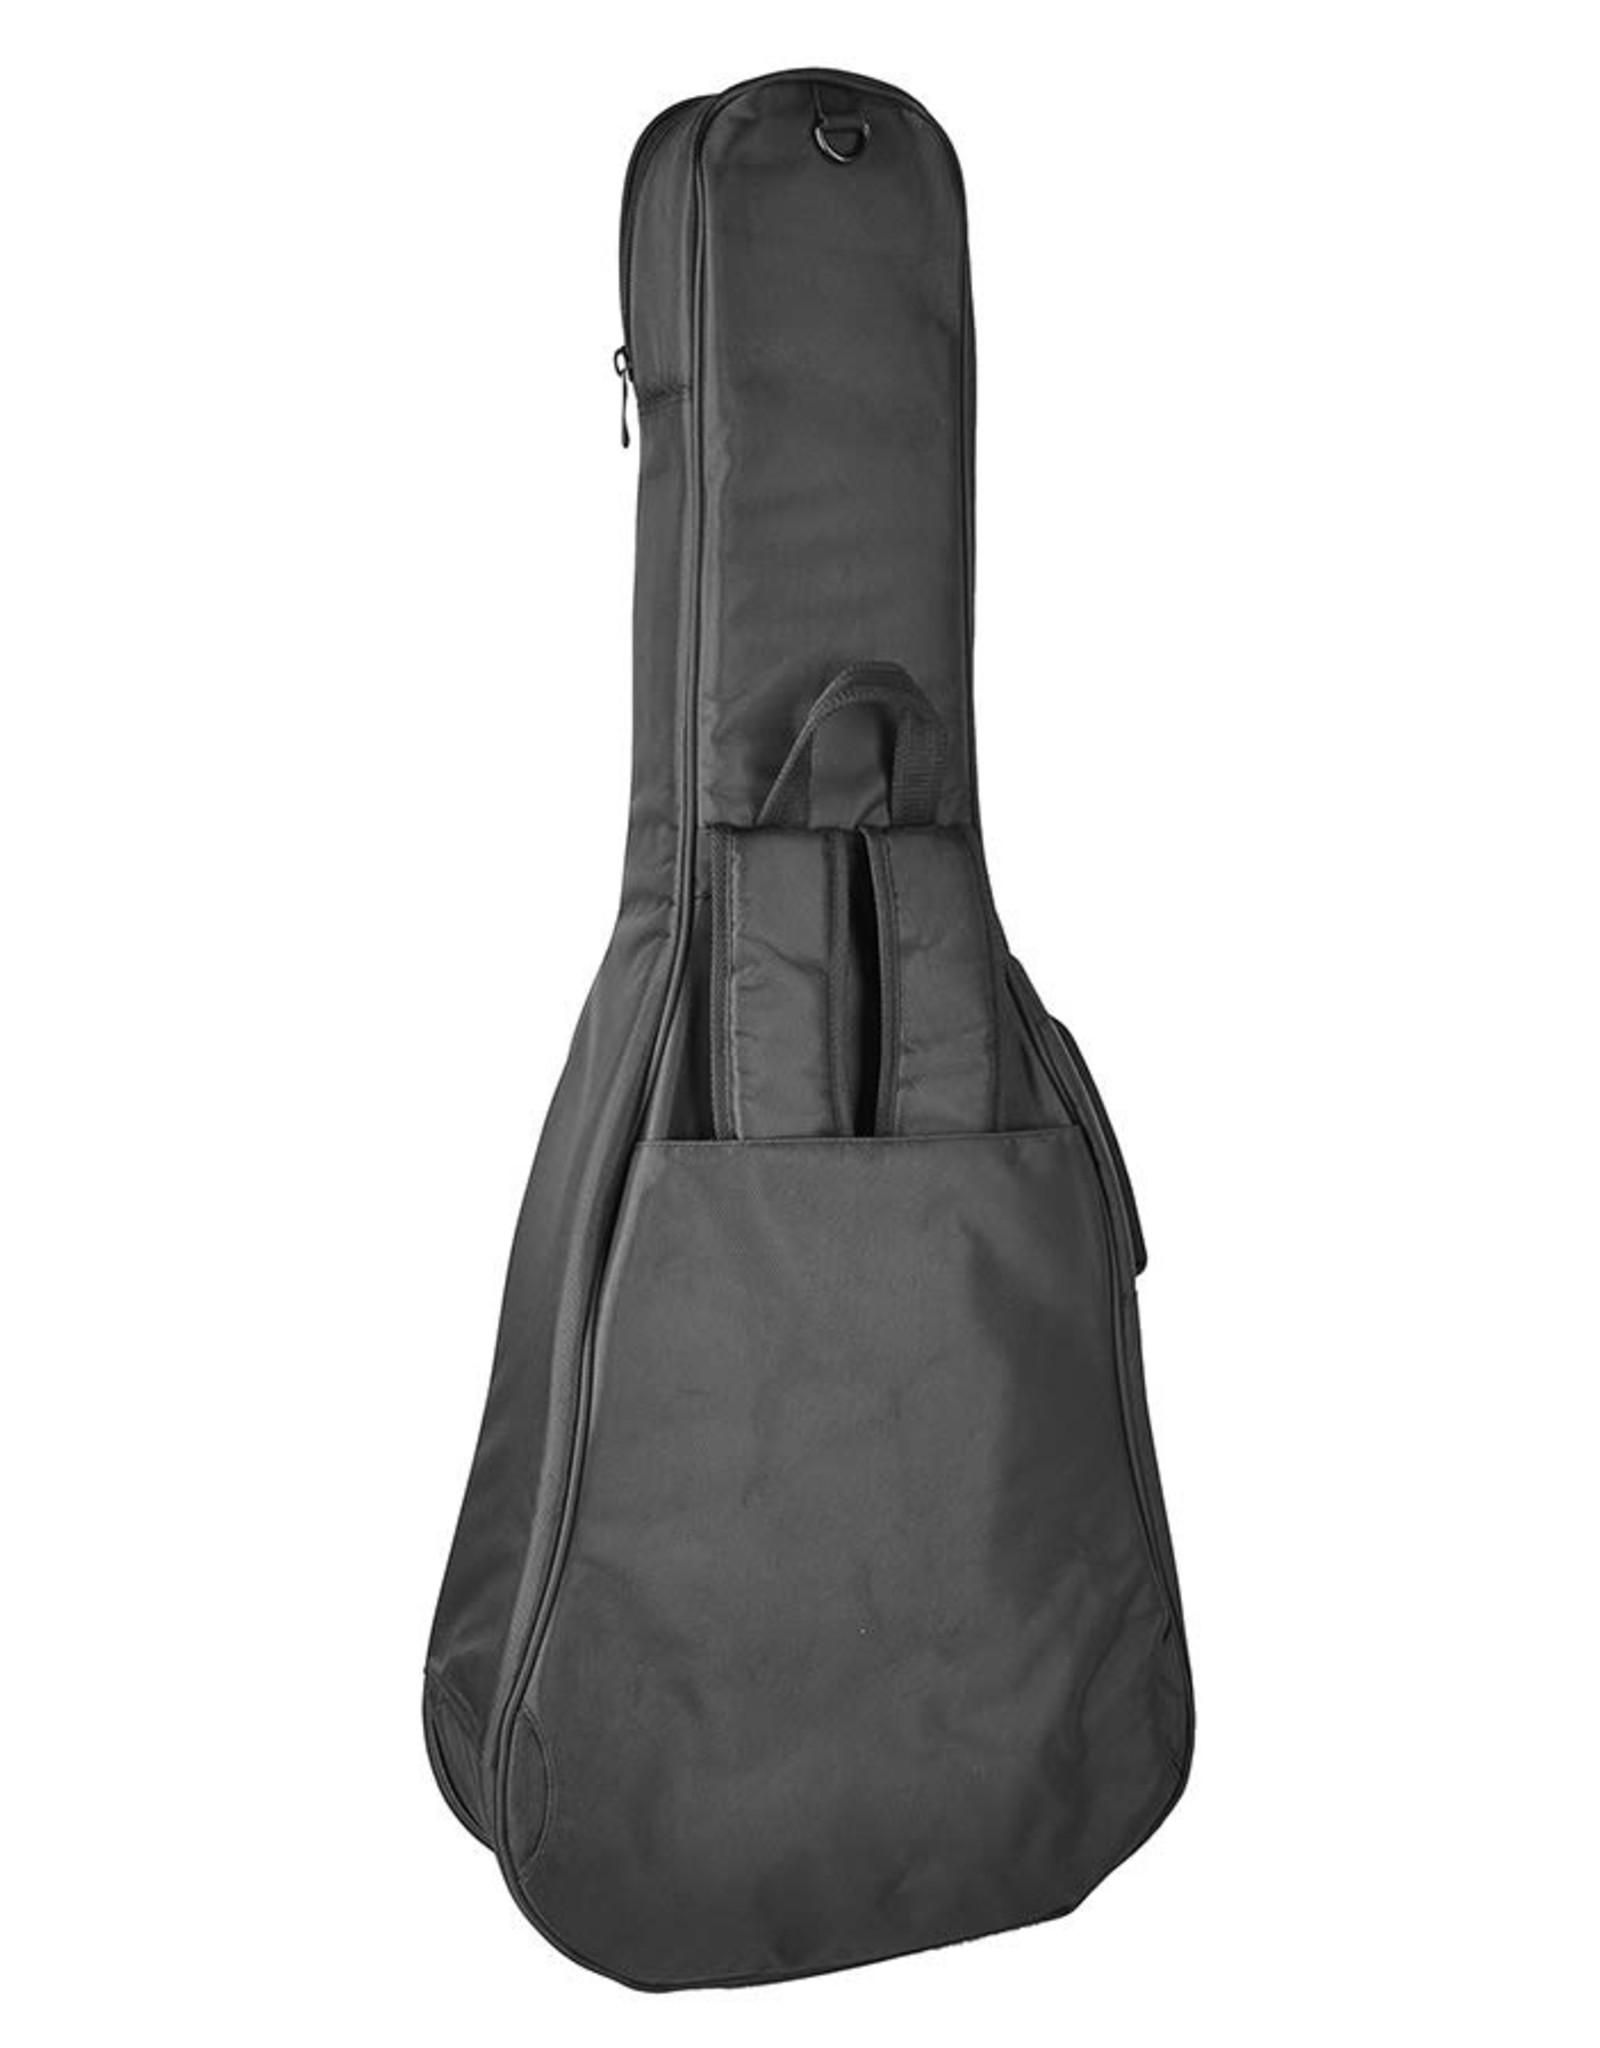 Boston Boston Deluxe gigbag for Classical guitar CGB-565